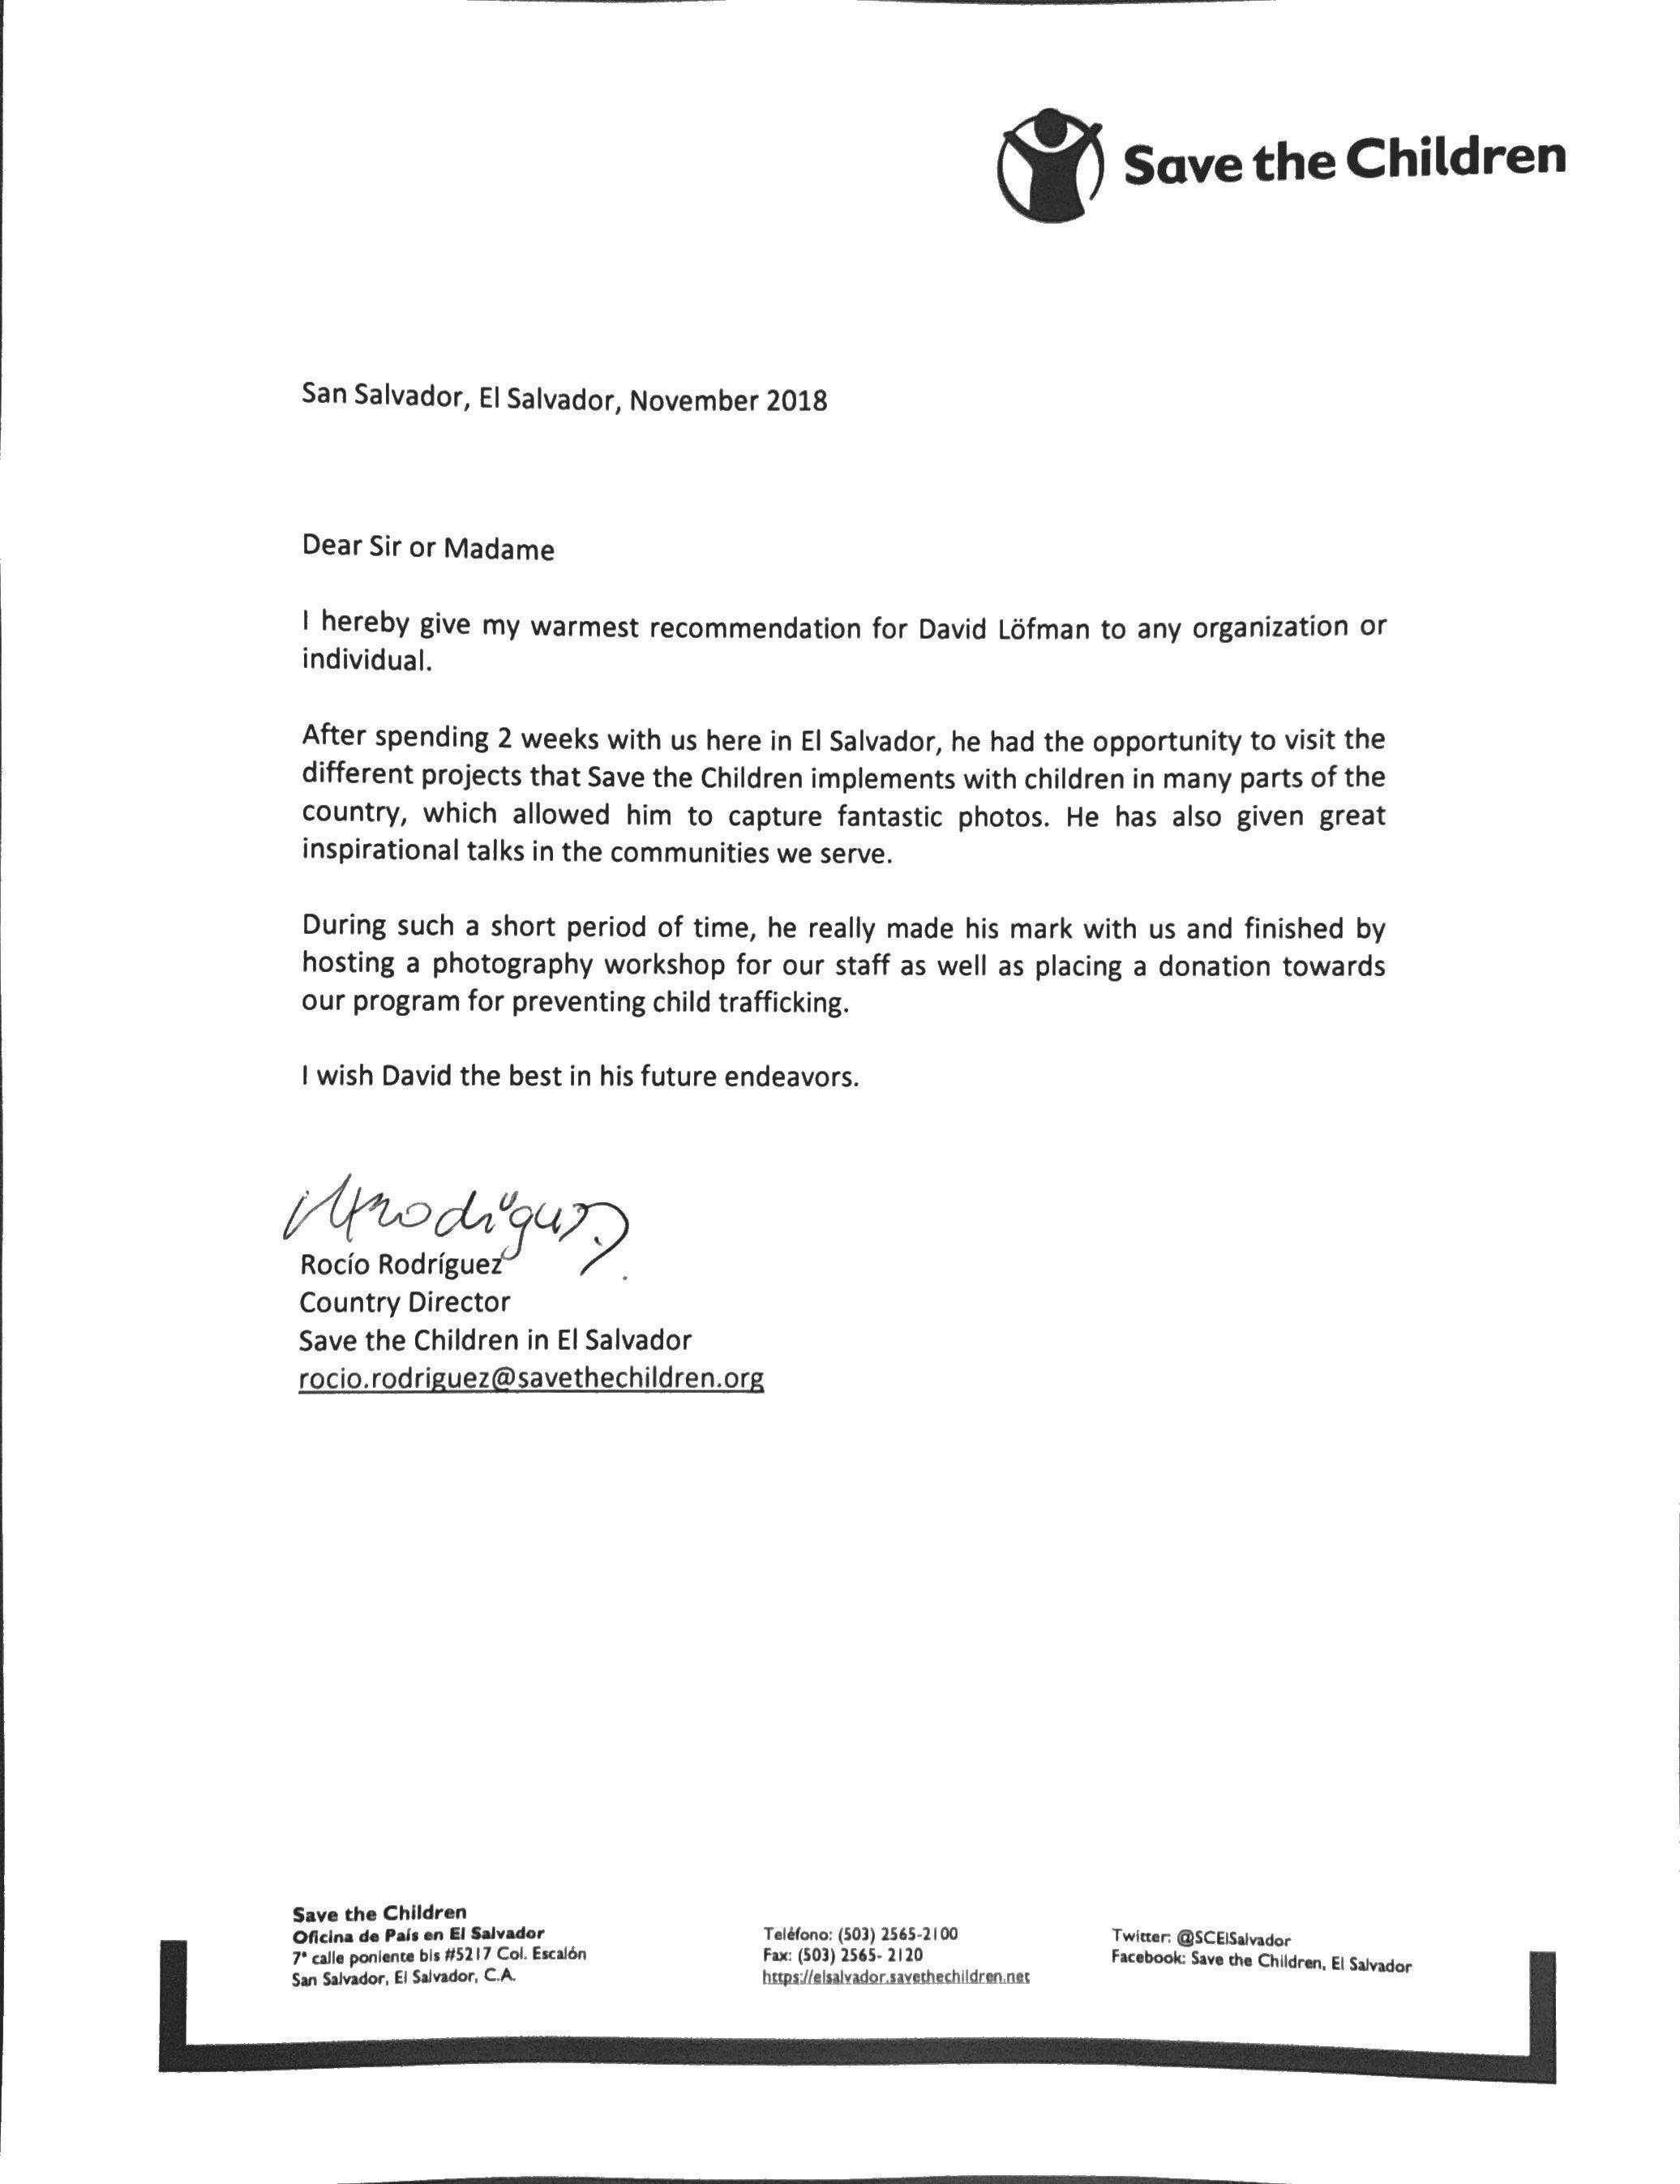 Save the Children Letter of Appreciation